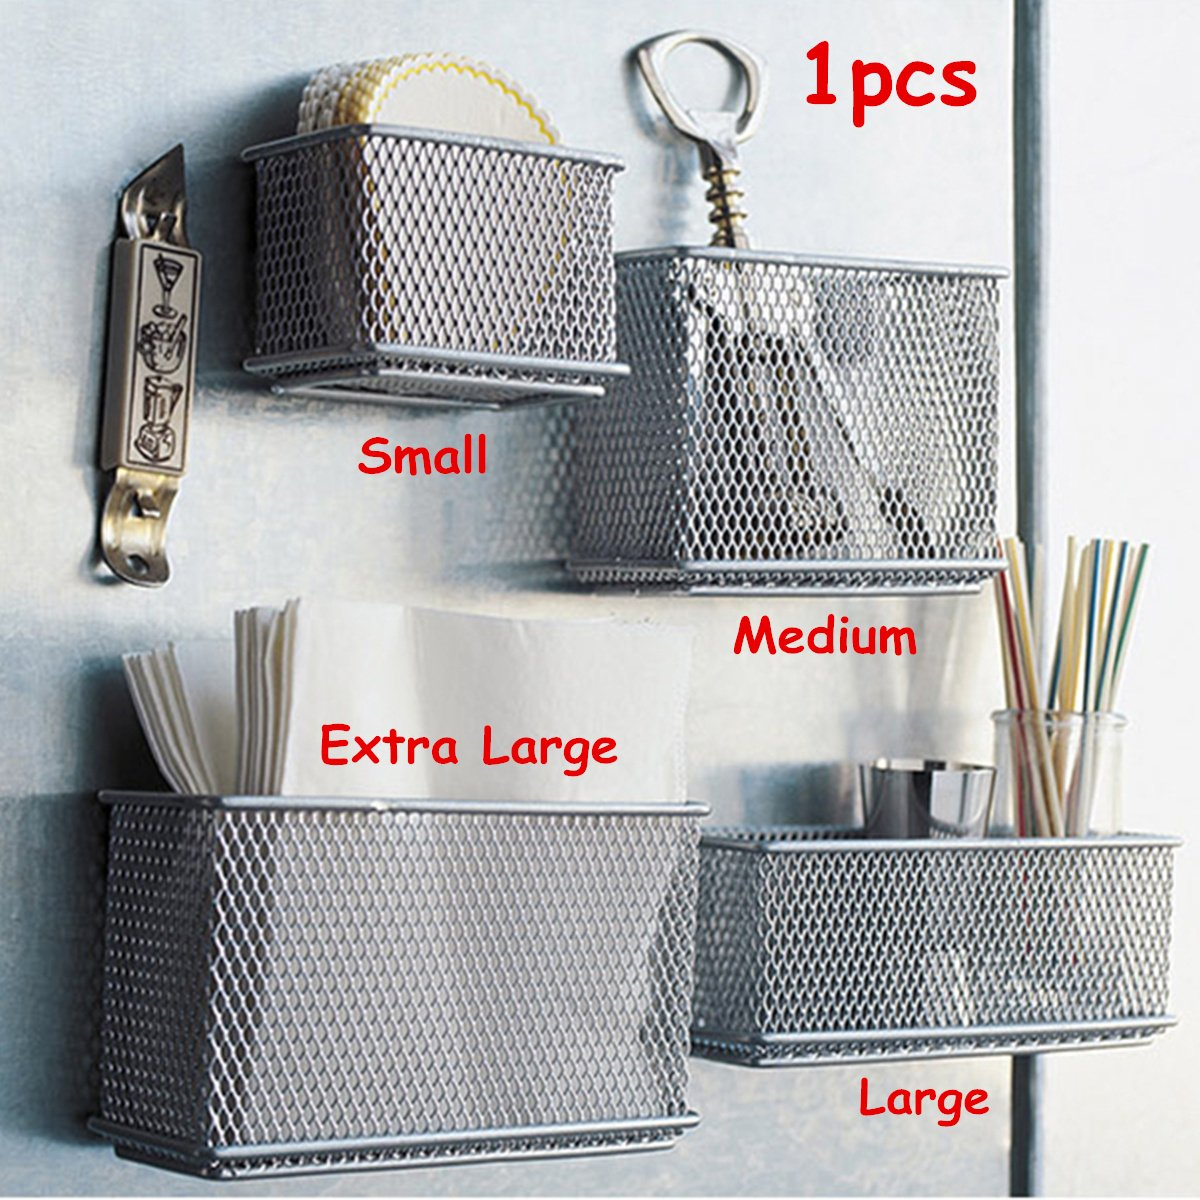 Caveen Wire Mesh Magnetic Storage Basket Tray Metal Desk Caddy Storage Organizer For Refrigerator Whiteboard Silver XL